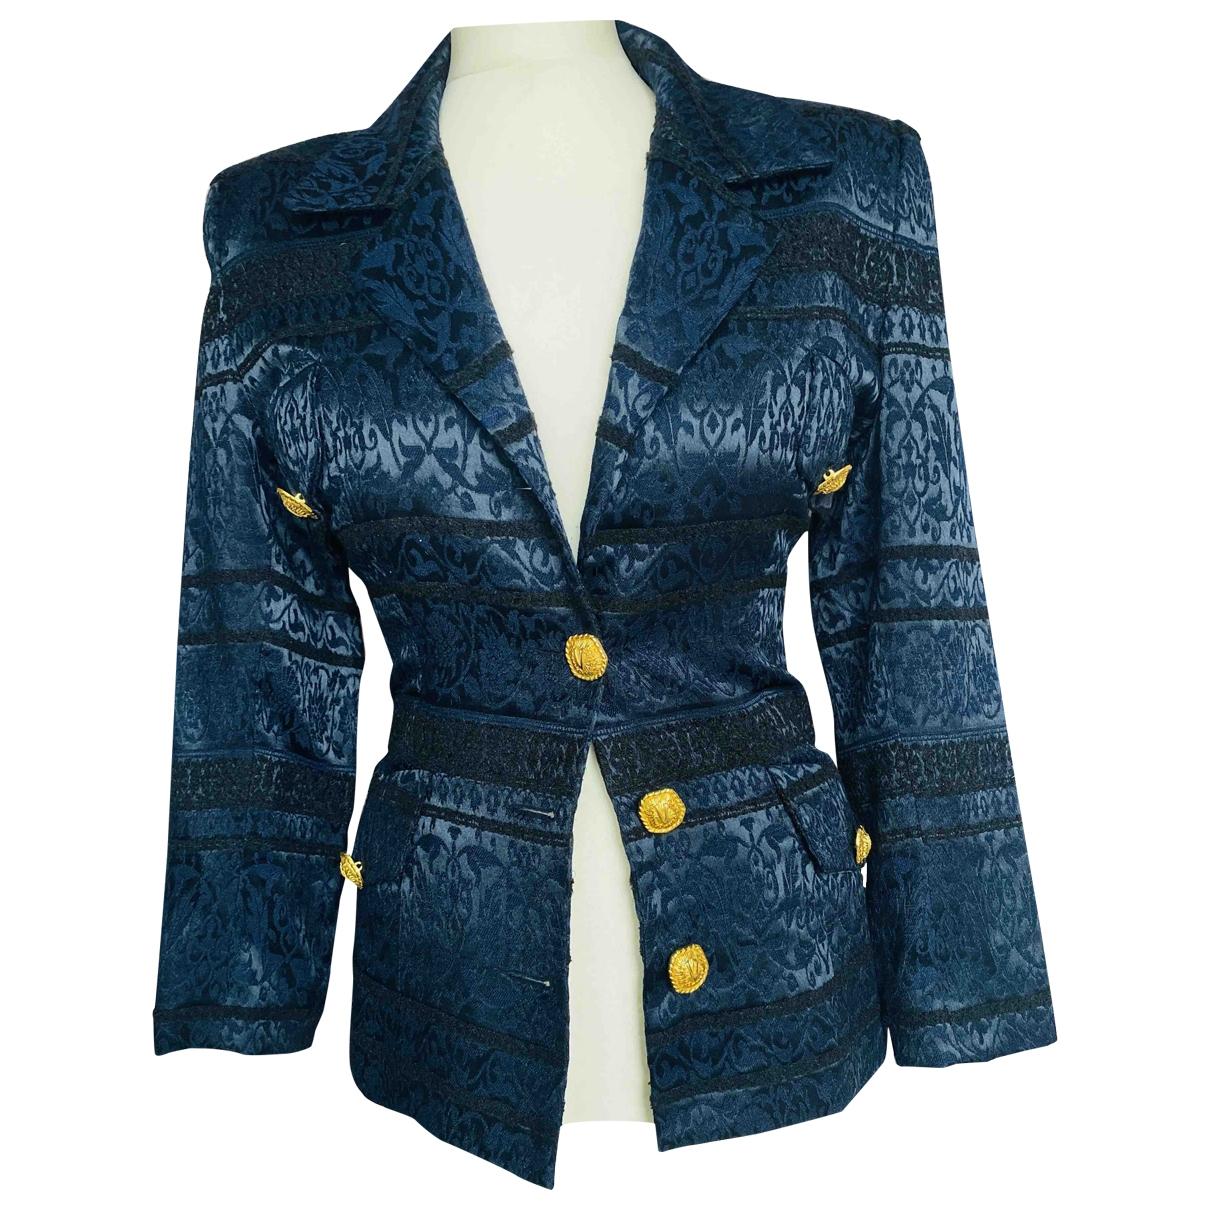 - Veste Epaulettes pour femme - marine